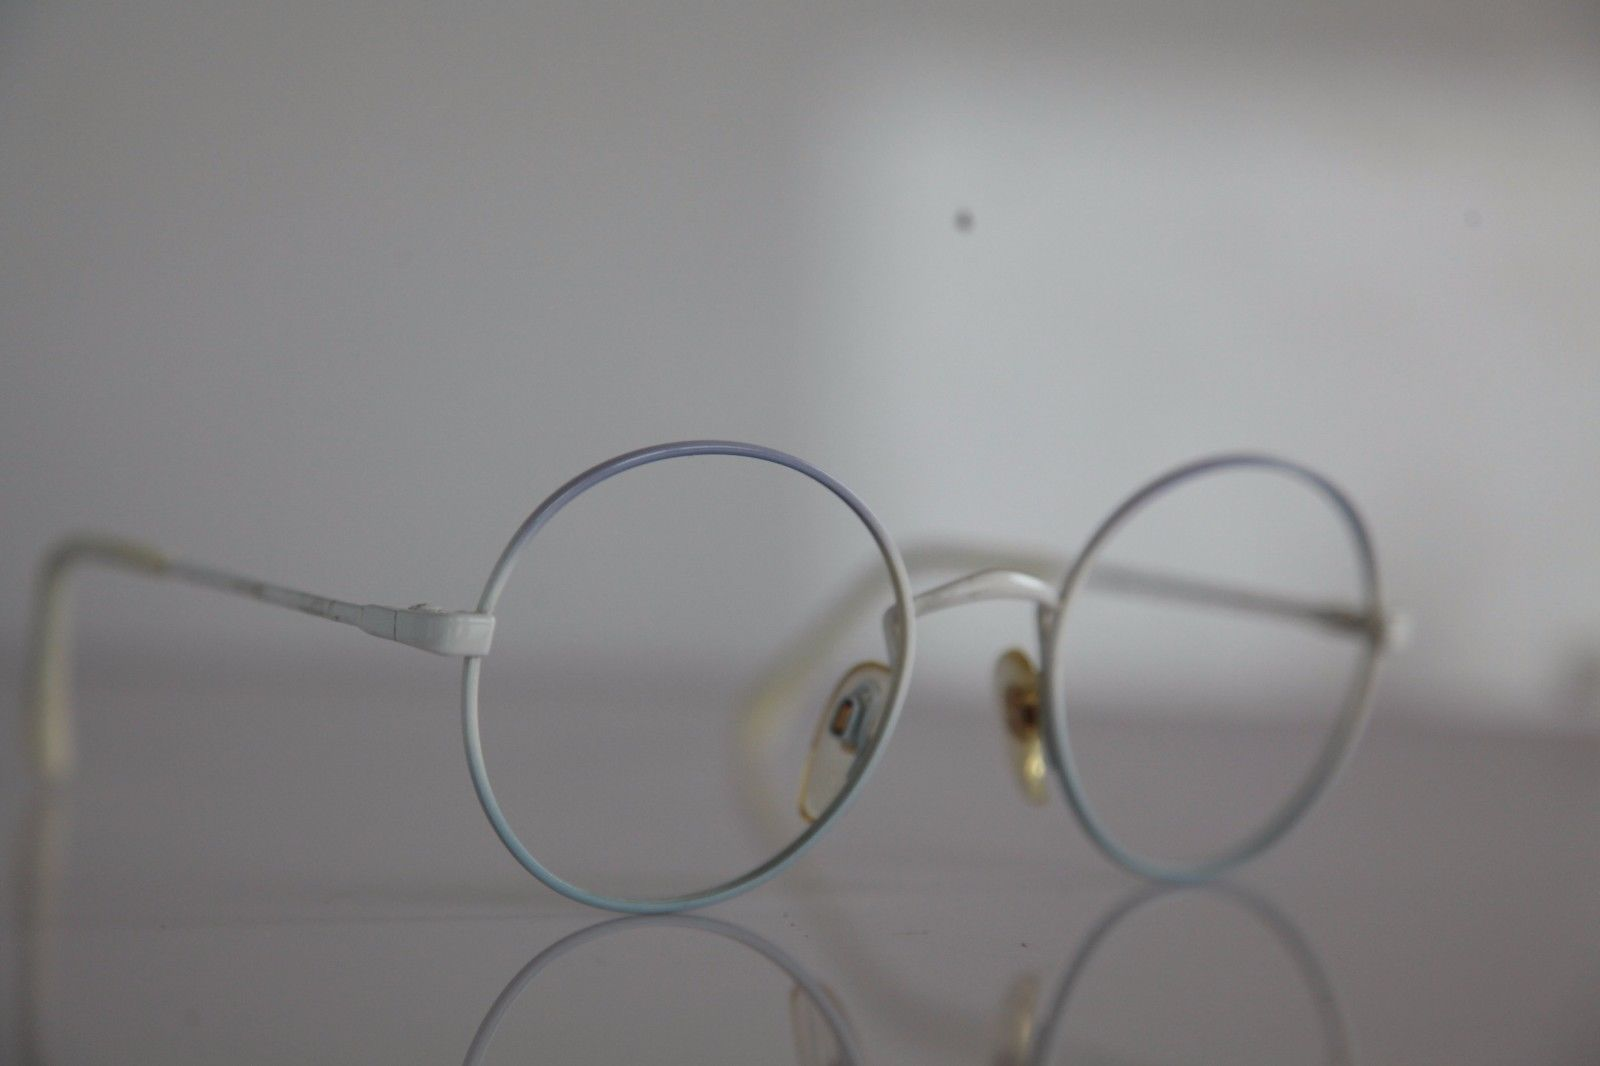 Vintage MENRAD Eyewear, White/ Blue Frame. Germany